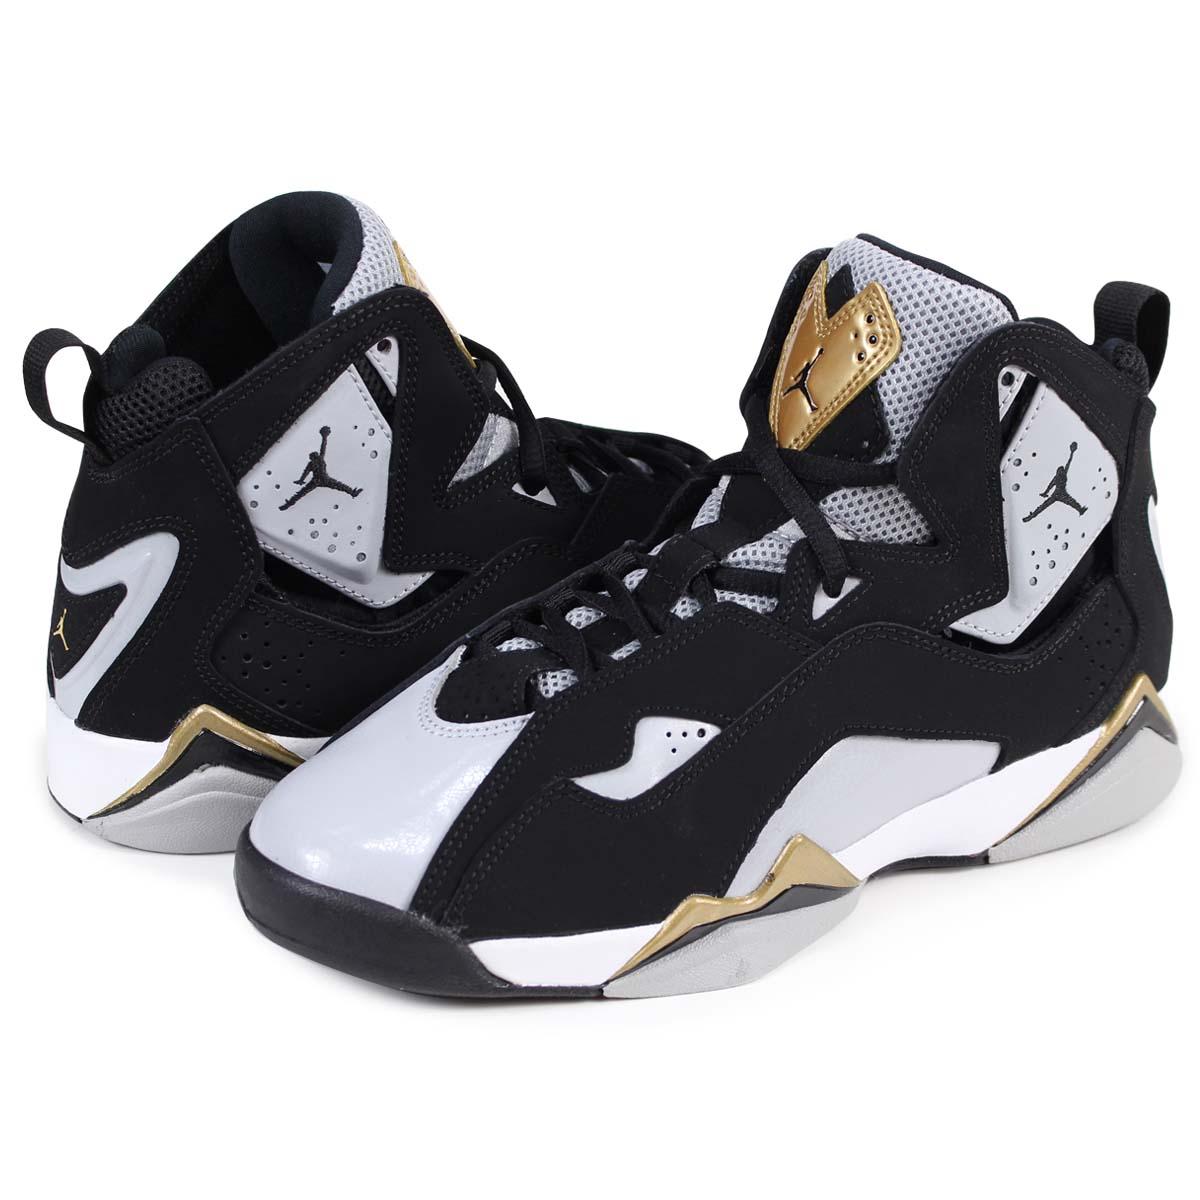 low cost bf0c6 8e5f0 NIKE JORDAN TRUE FLIGHT BG Nike Jordan toe roof light Lady s sneakers  343,795-032 black ...